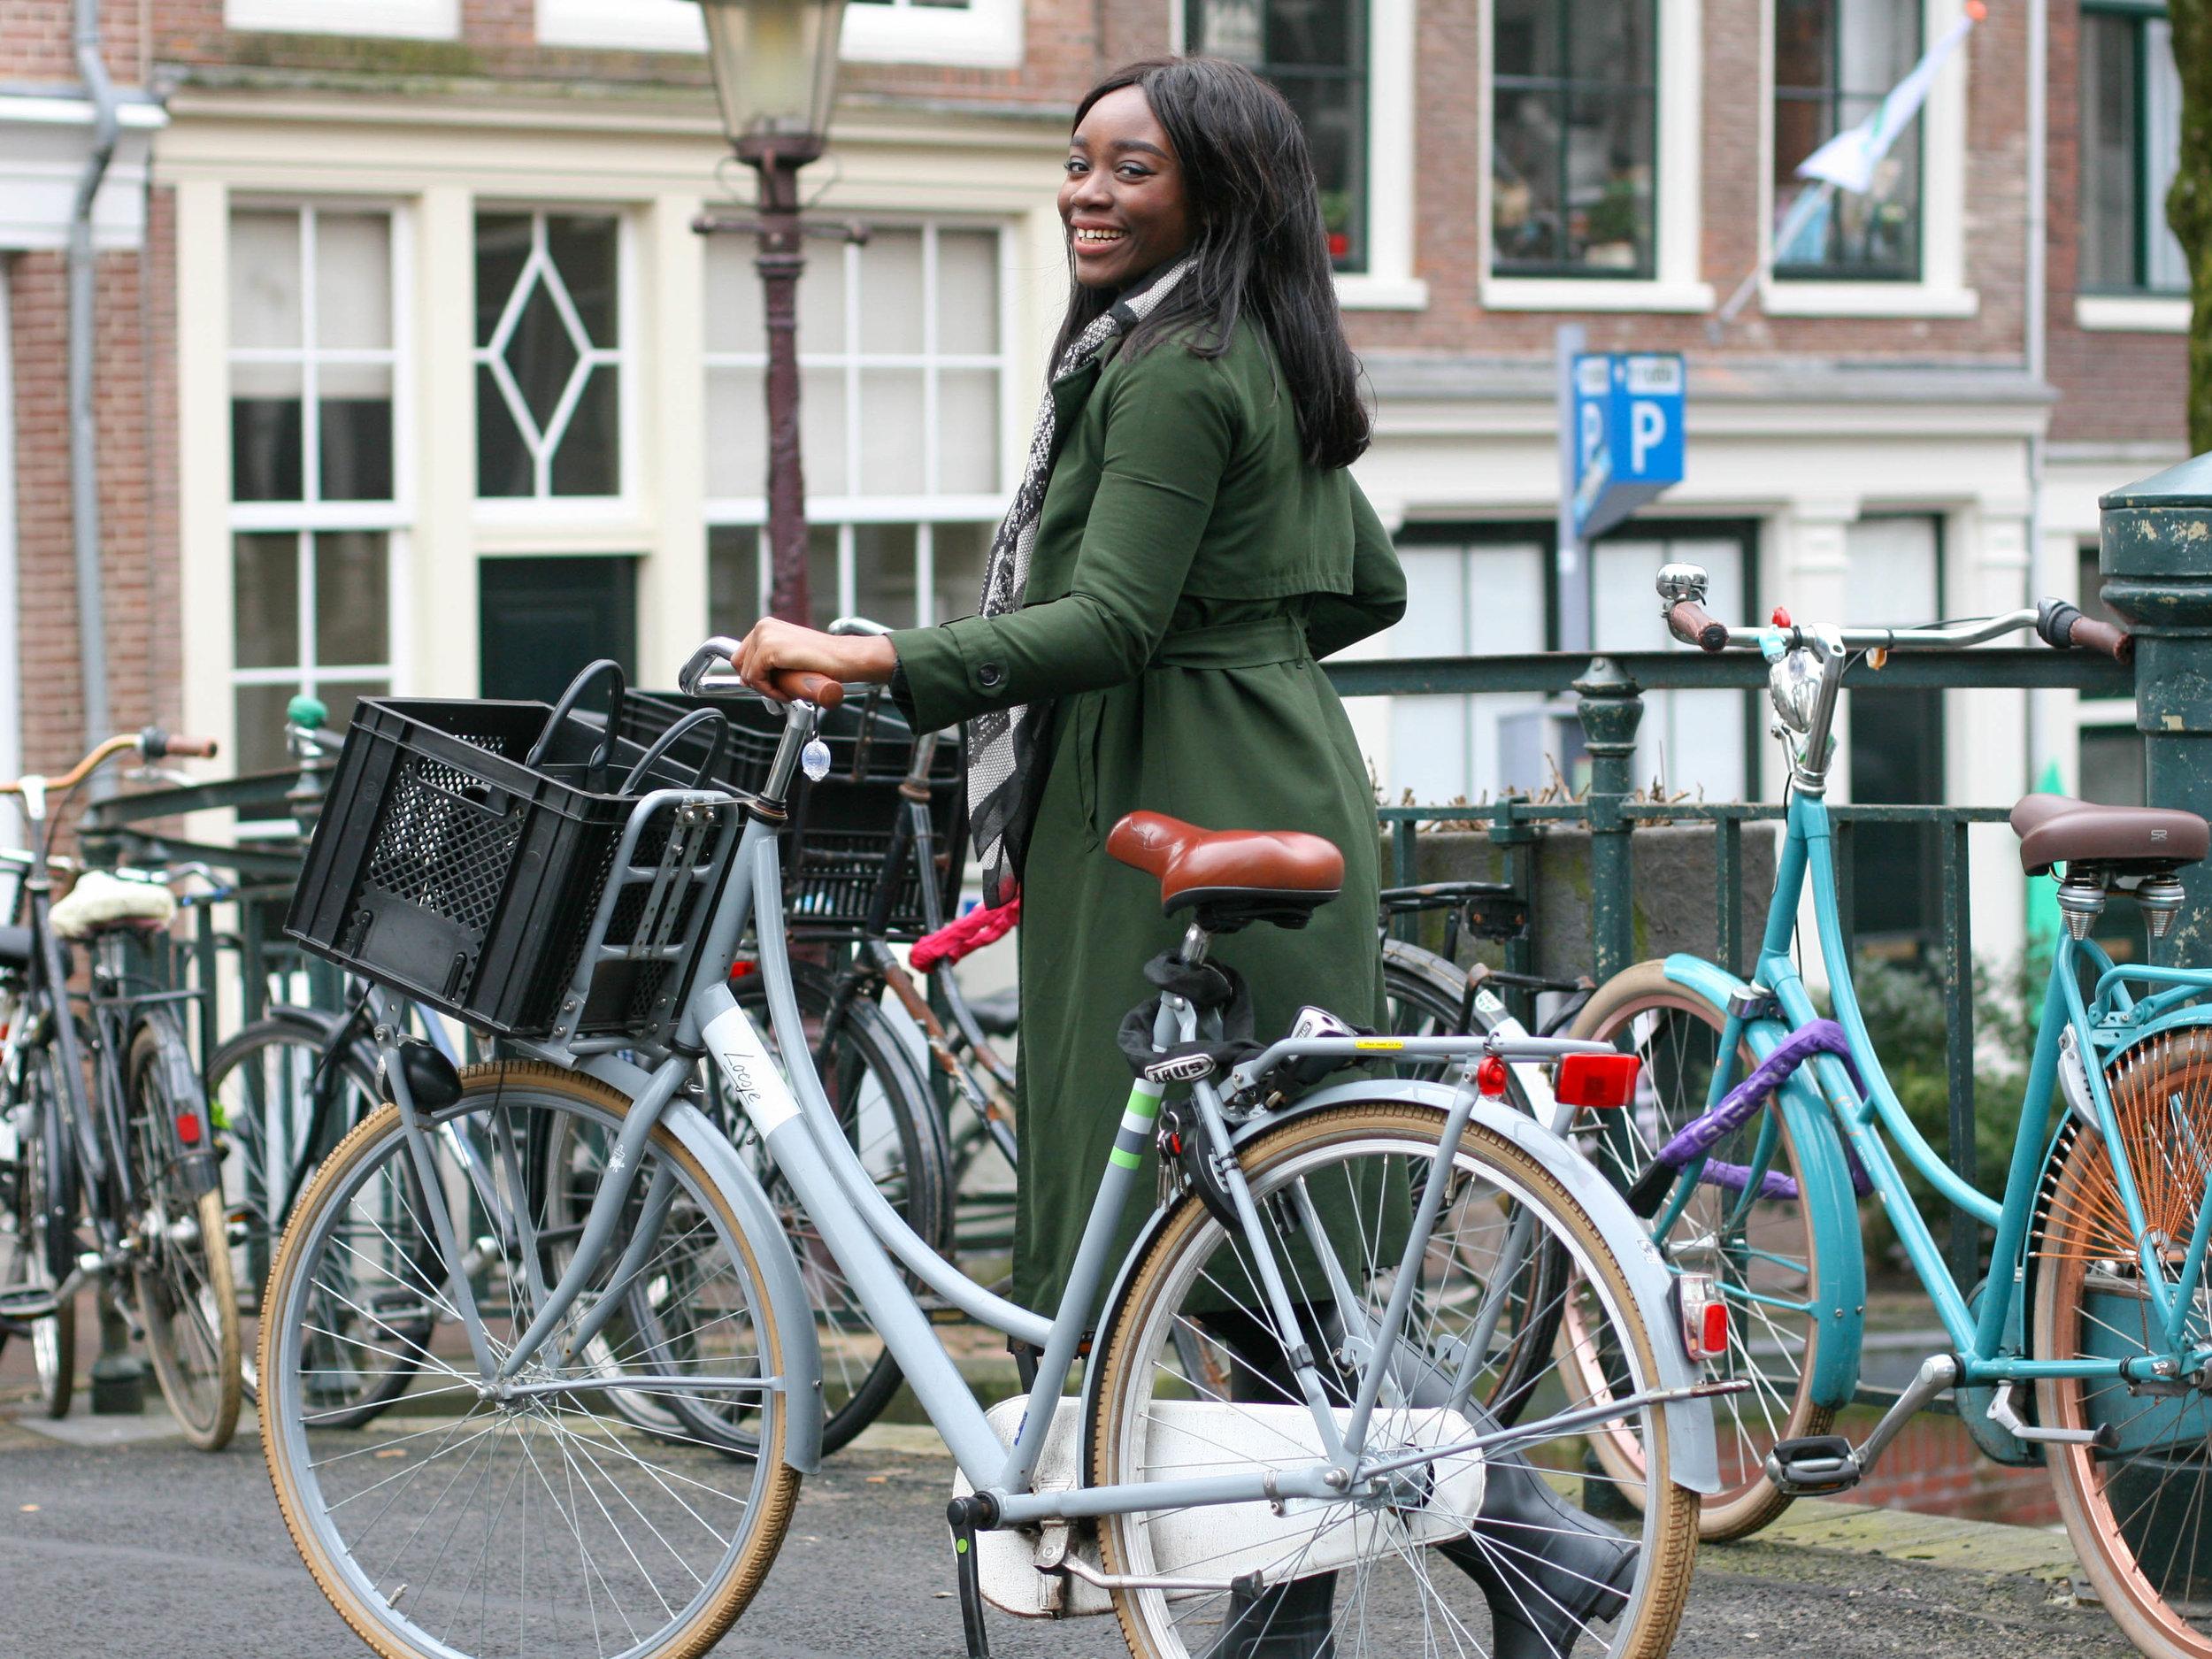 Amsterdam-Cycle-Chic-March-1.jpg